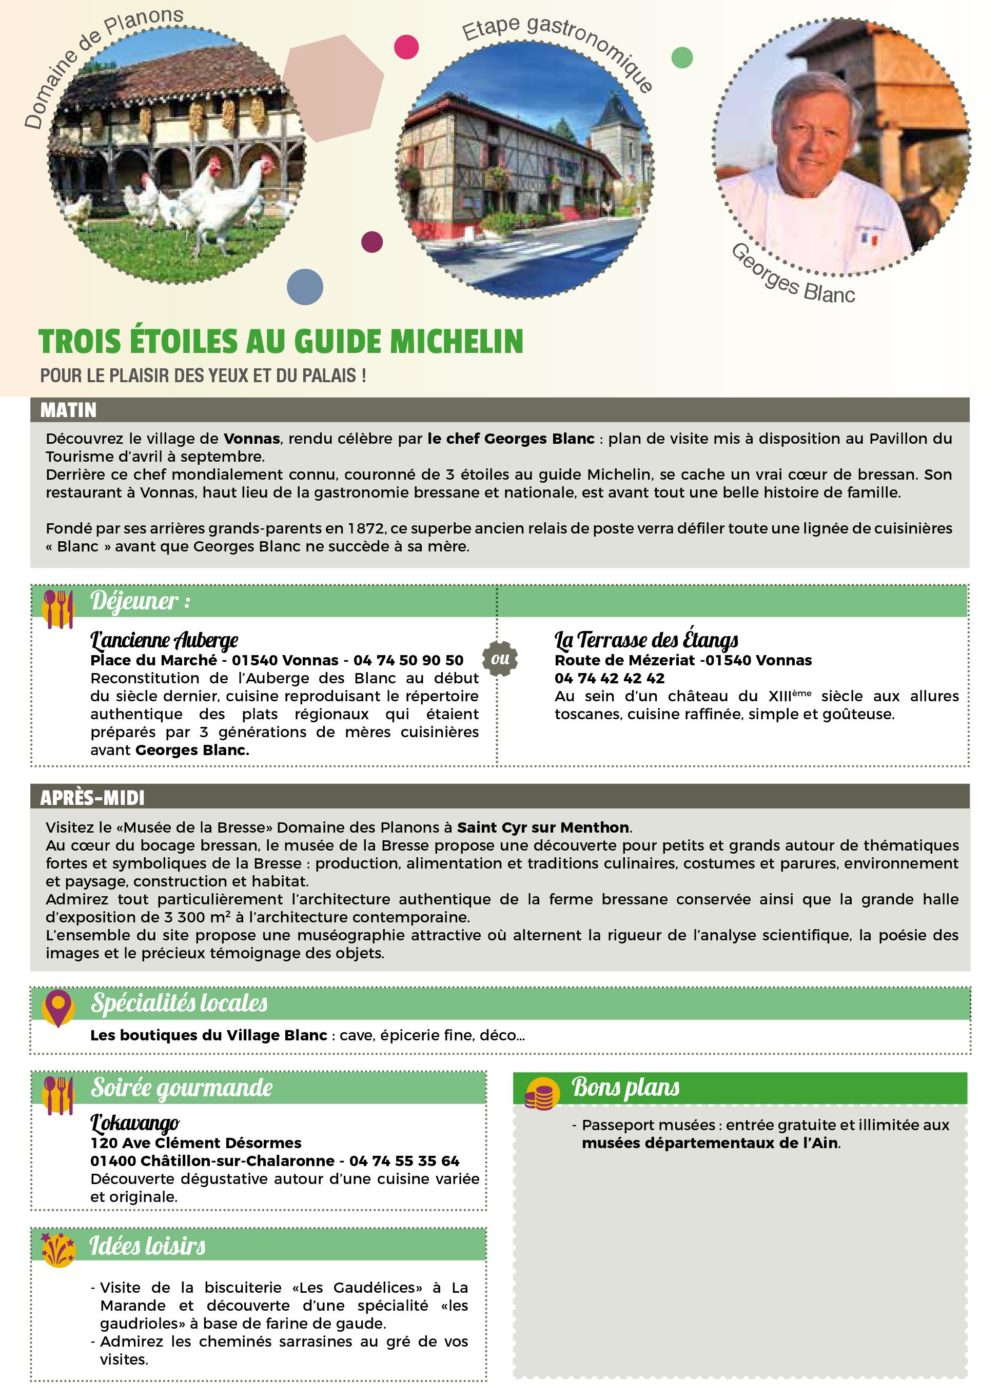 carnet de voyage 2019 - saone - page 6 3 etoiles